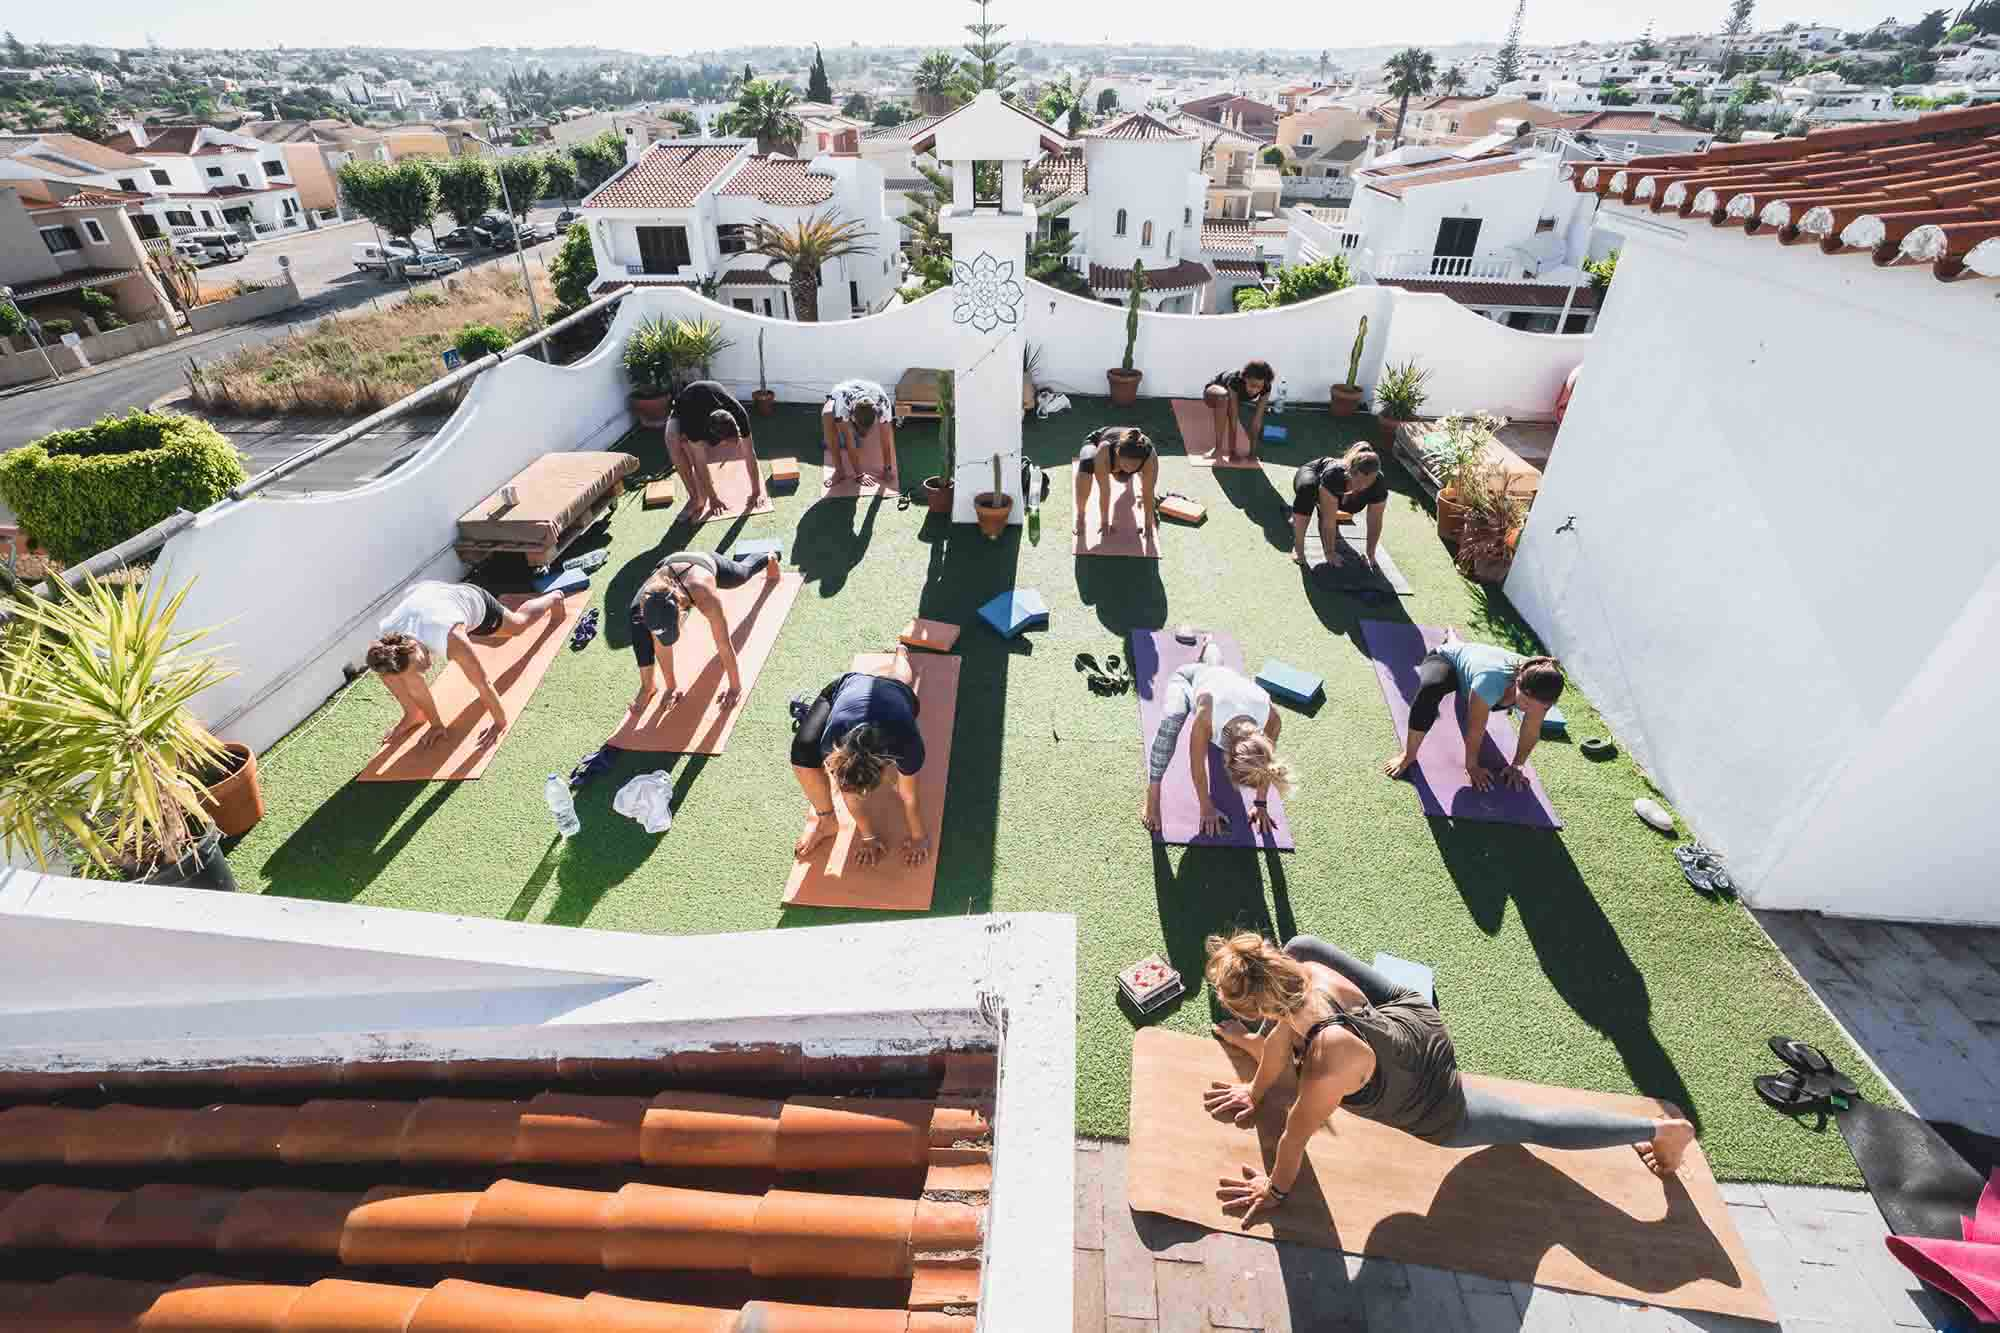 Bura Surfhouse - Rooftop Yoga full size